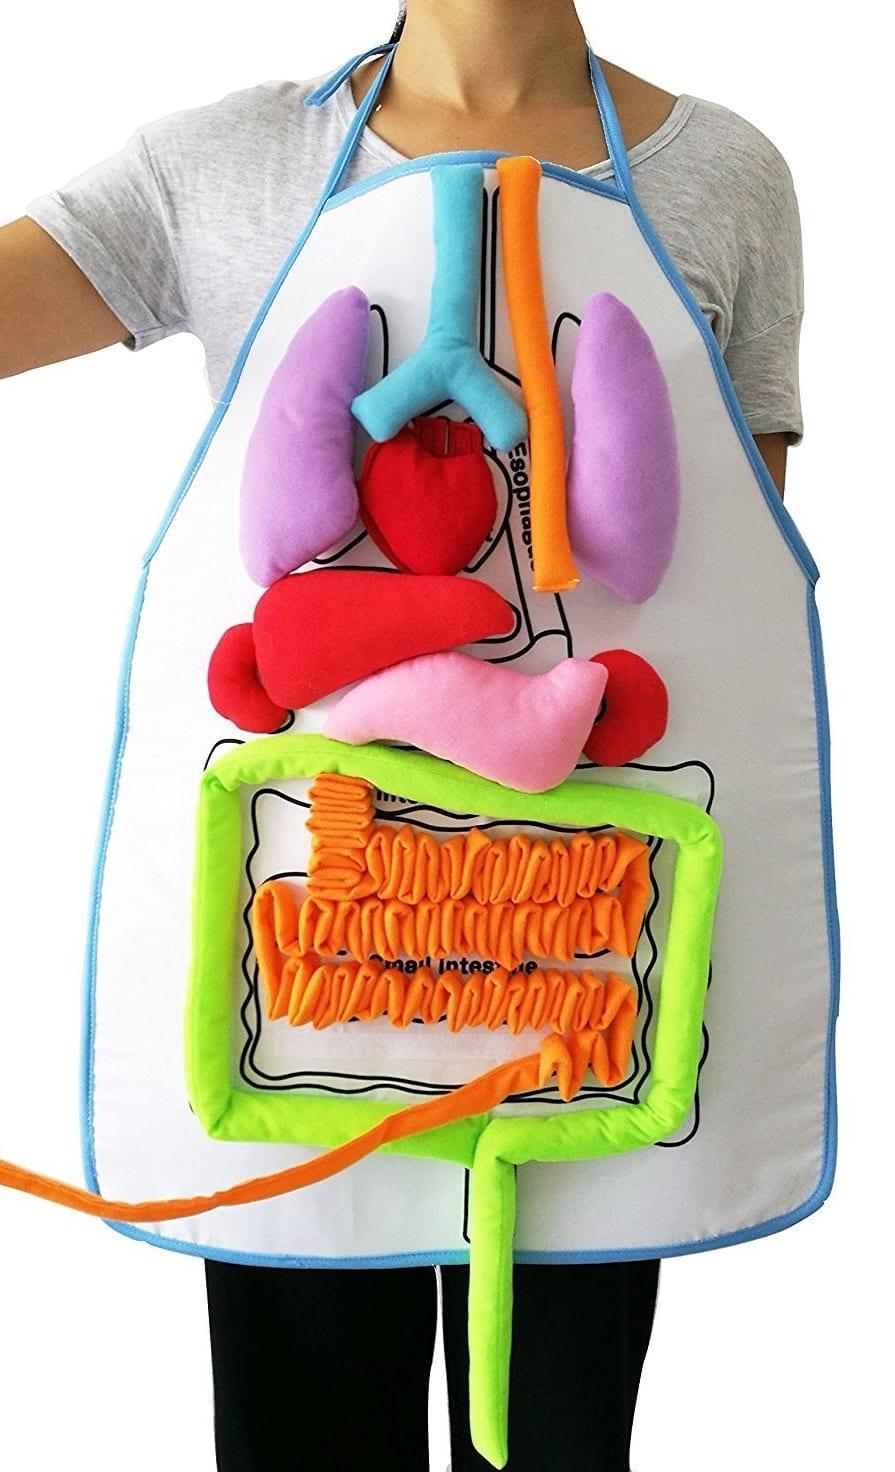 Apron Human Body Organs Awareness Educational Insights Toys